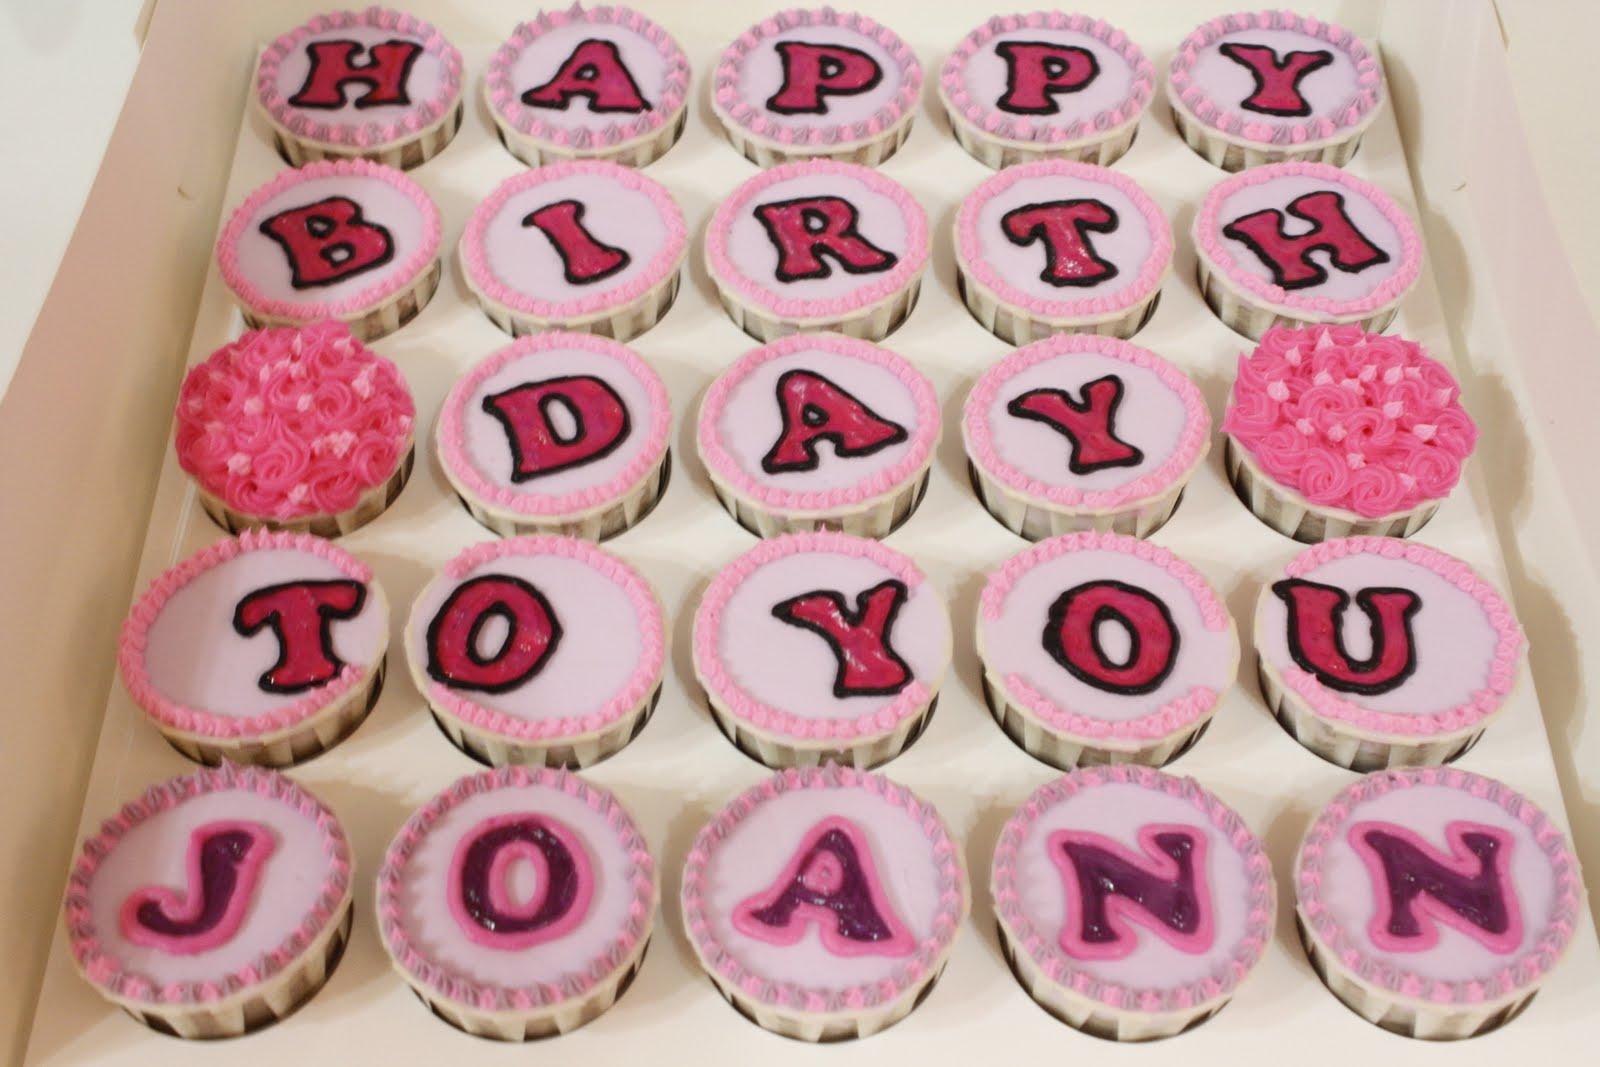 happy birthday joann Lil'bite Bakery: Happy Birthday To You Joann! happy birthday joann